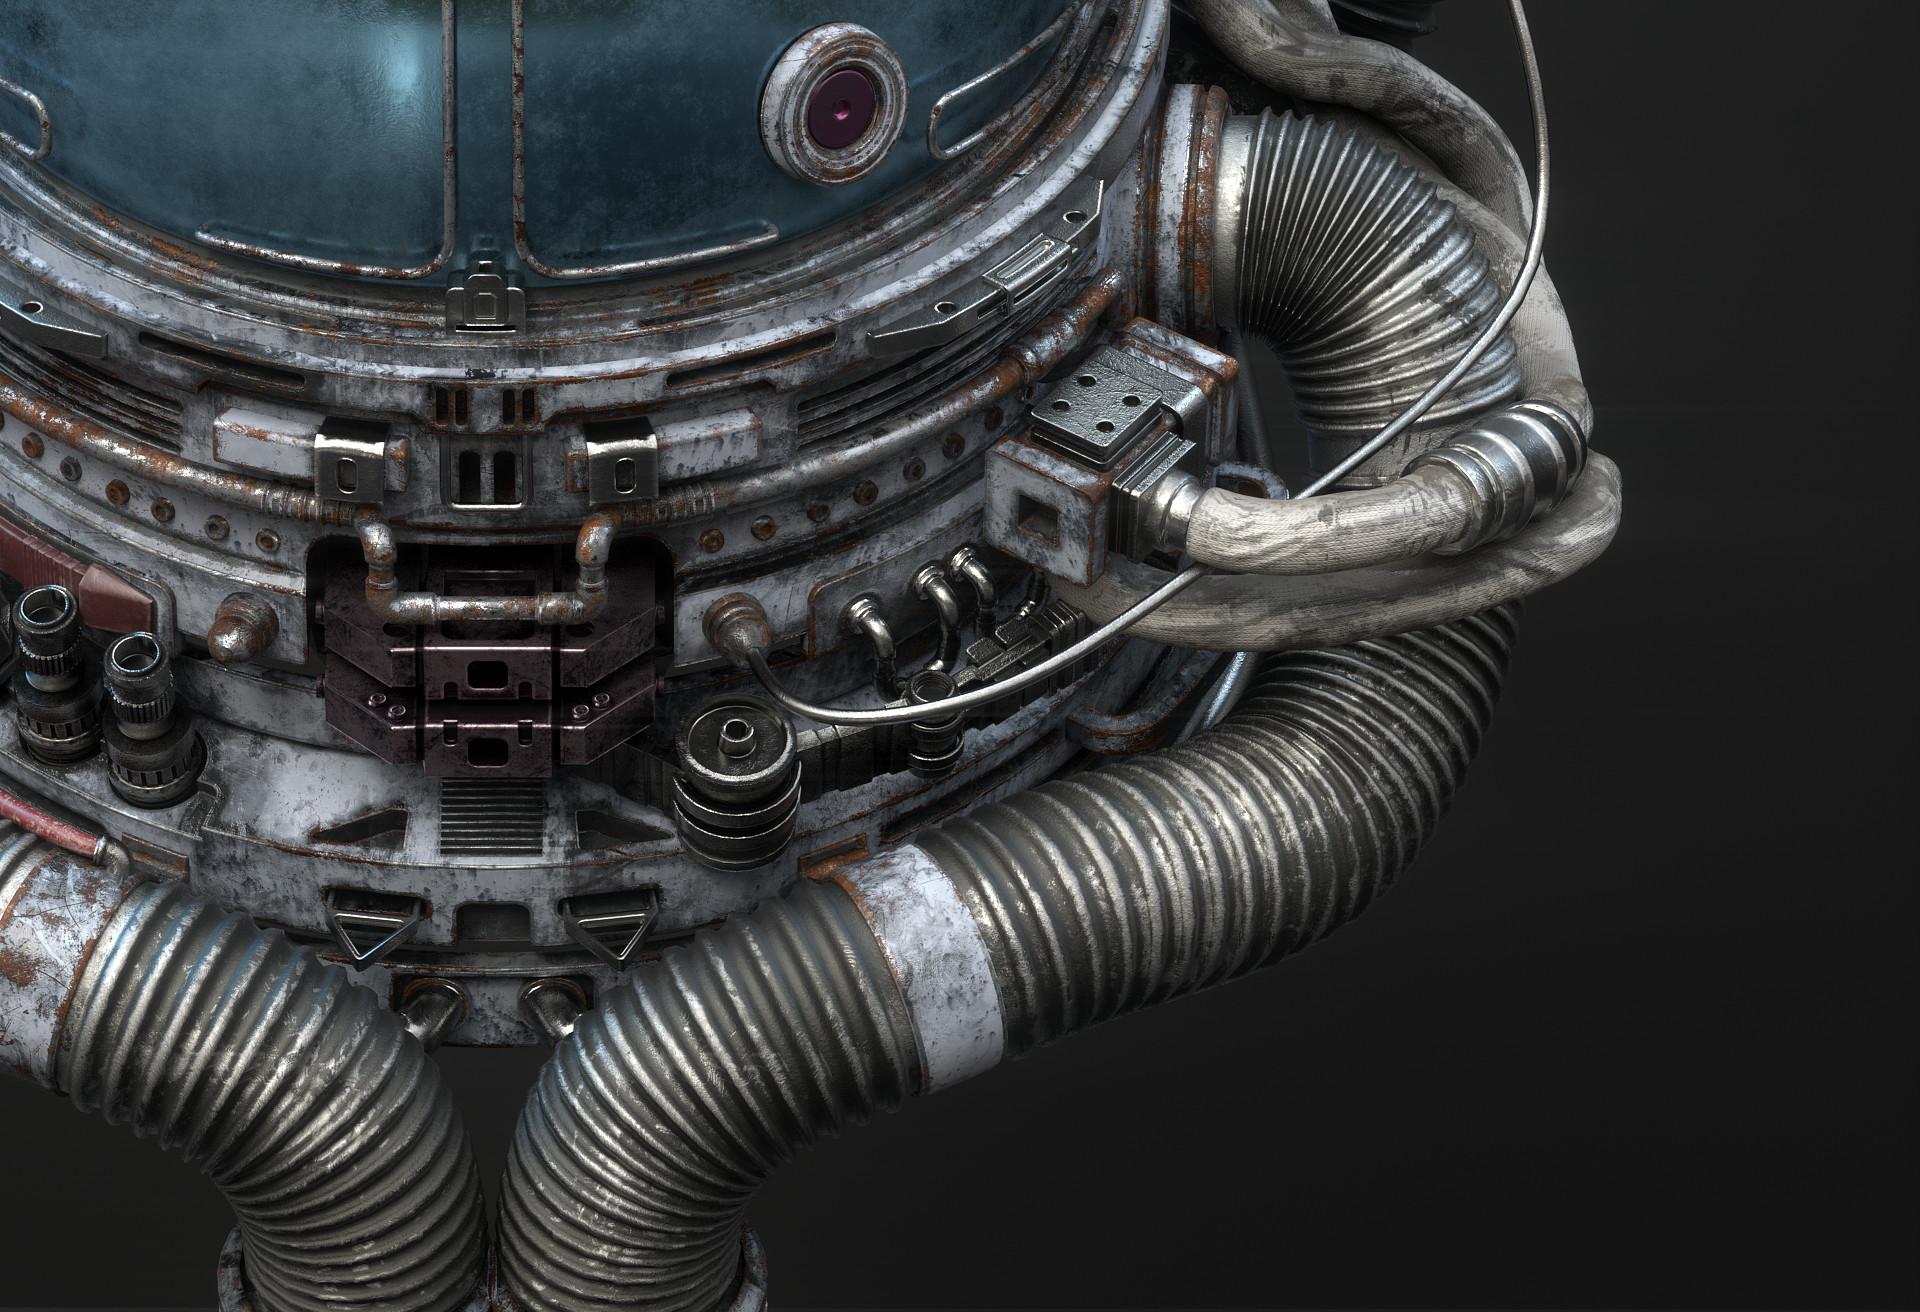 Antoni depowski astronaut2